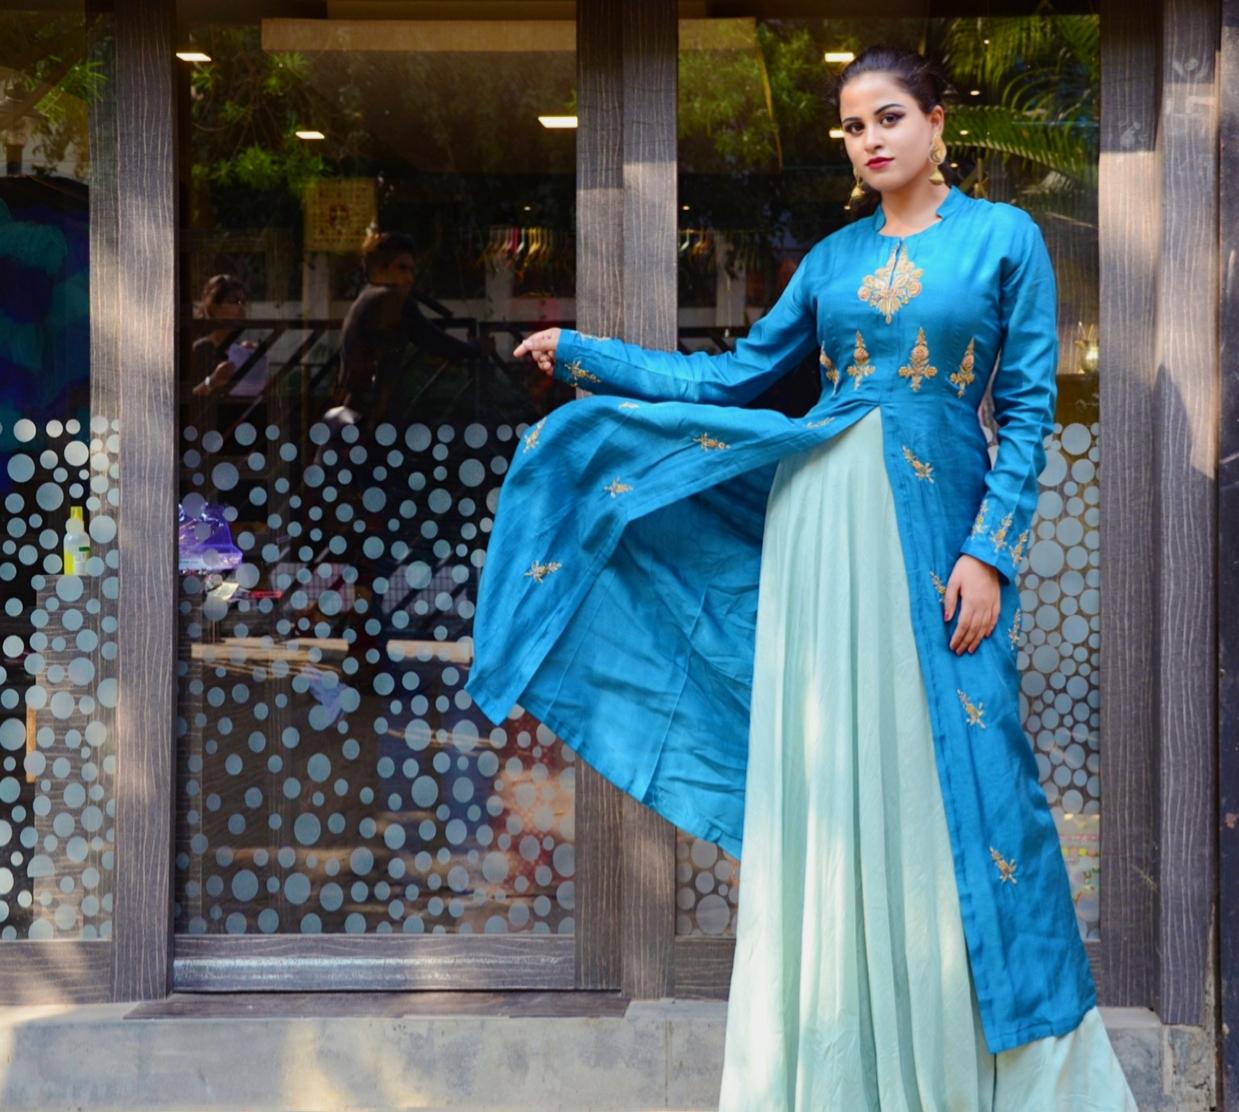 Thevoguegirl_-Melange Exhibition & Sale Bhubaneswar 2019.